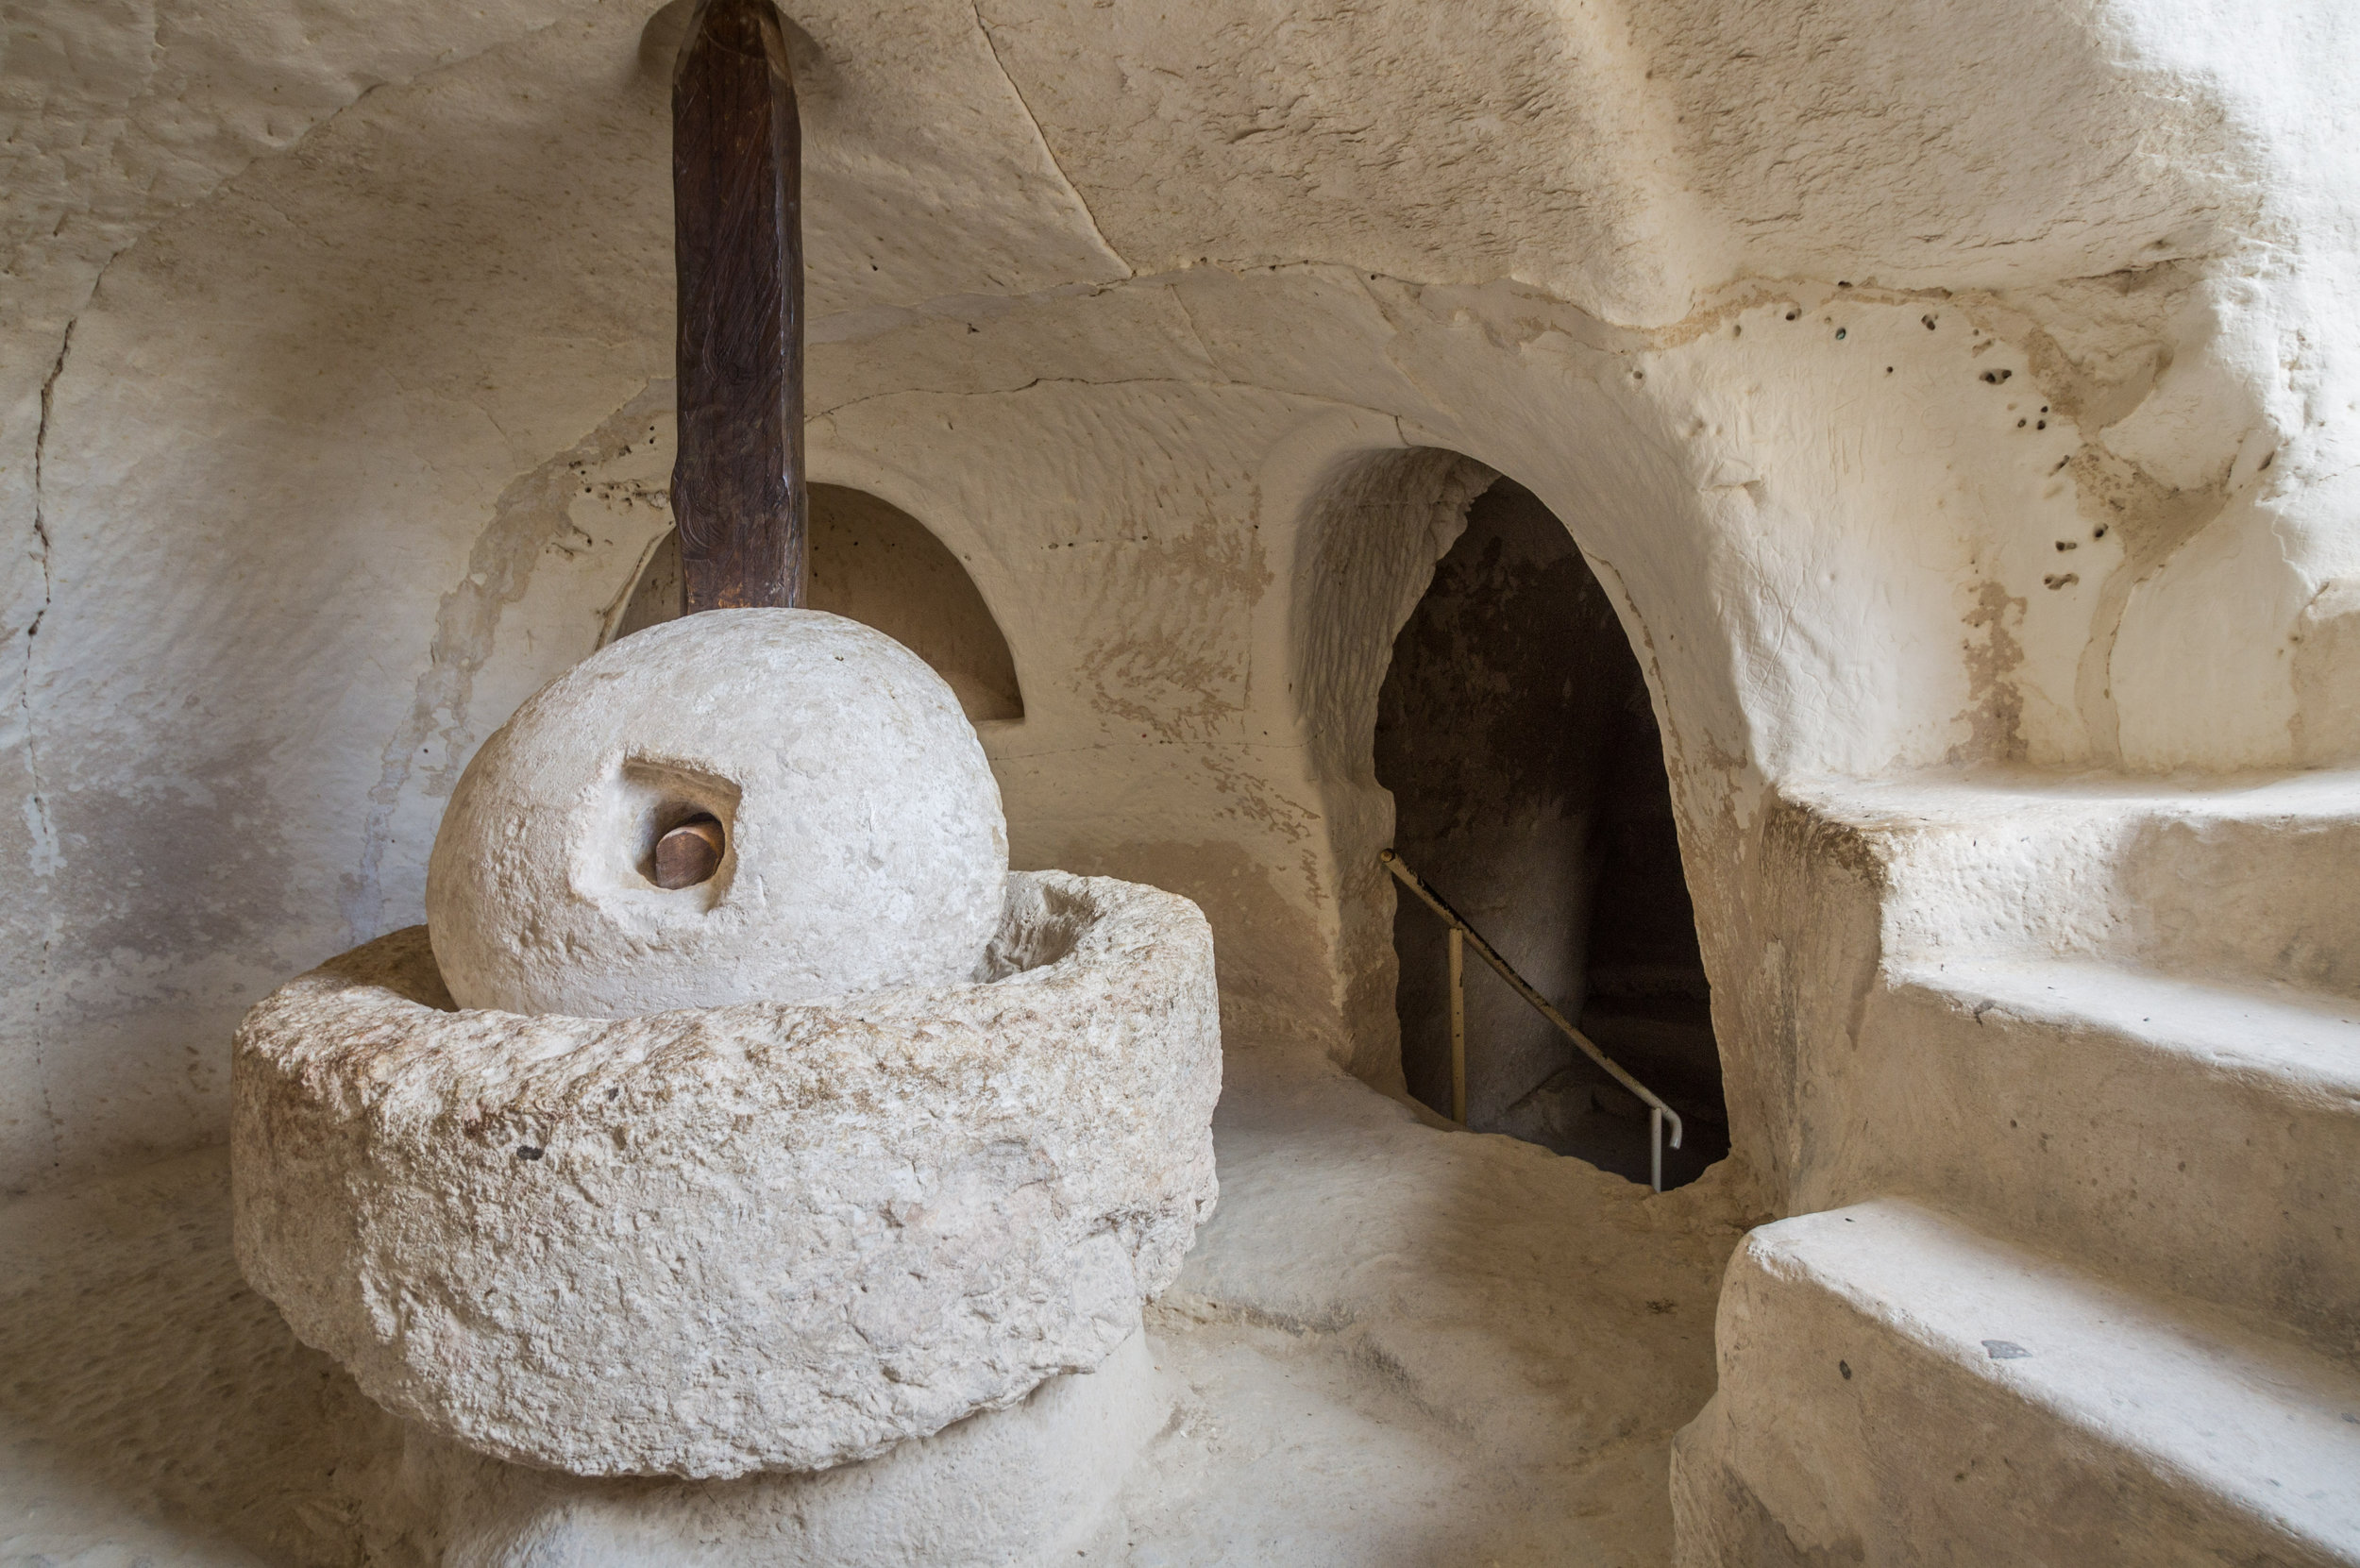 Antique presse à huile d'olive, Beit Guvrin, Israël